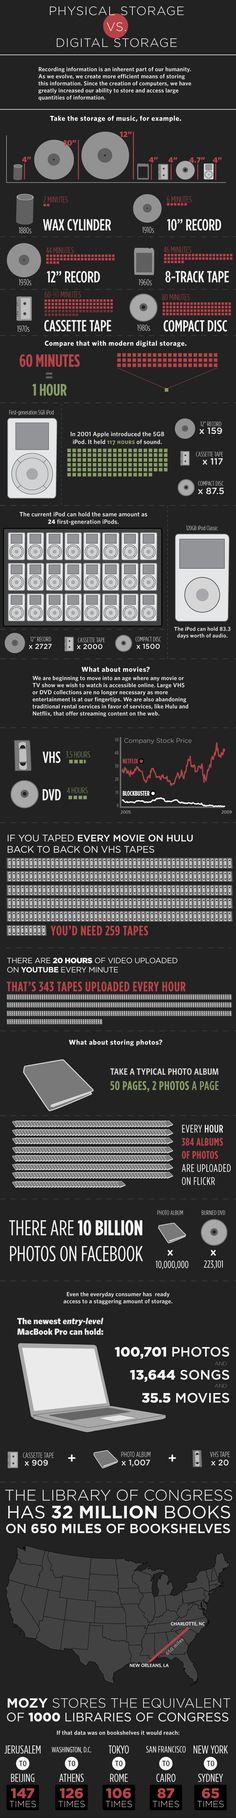 Del almacenamiento analógico al almacenamiento digital #infografia #infographic